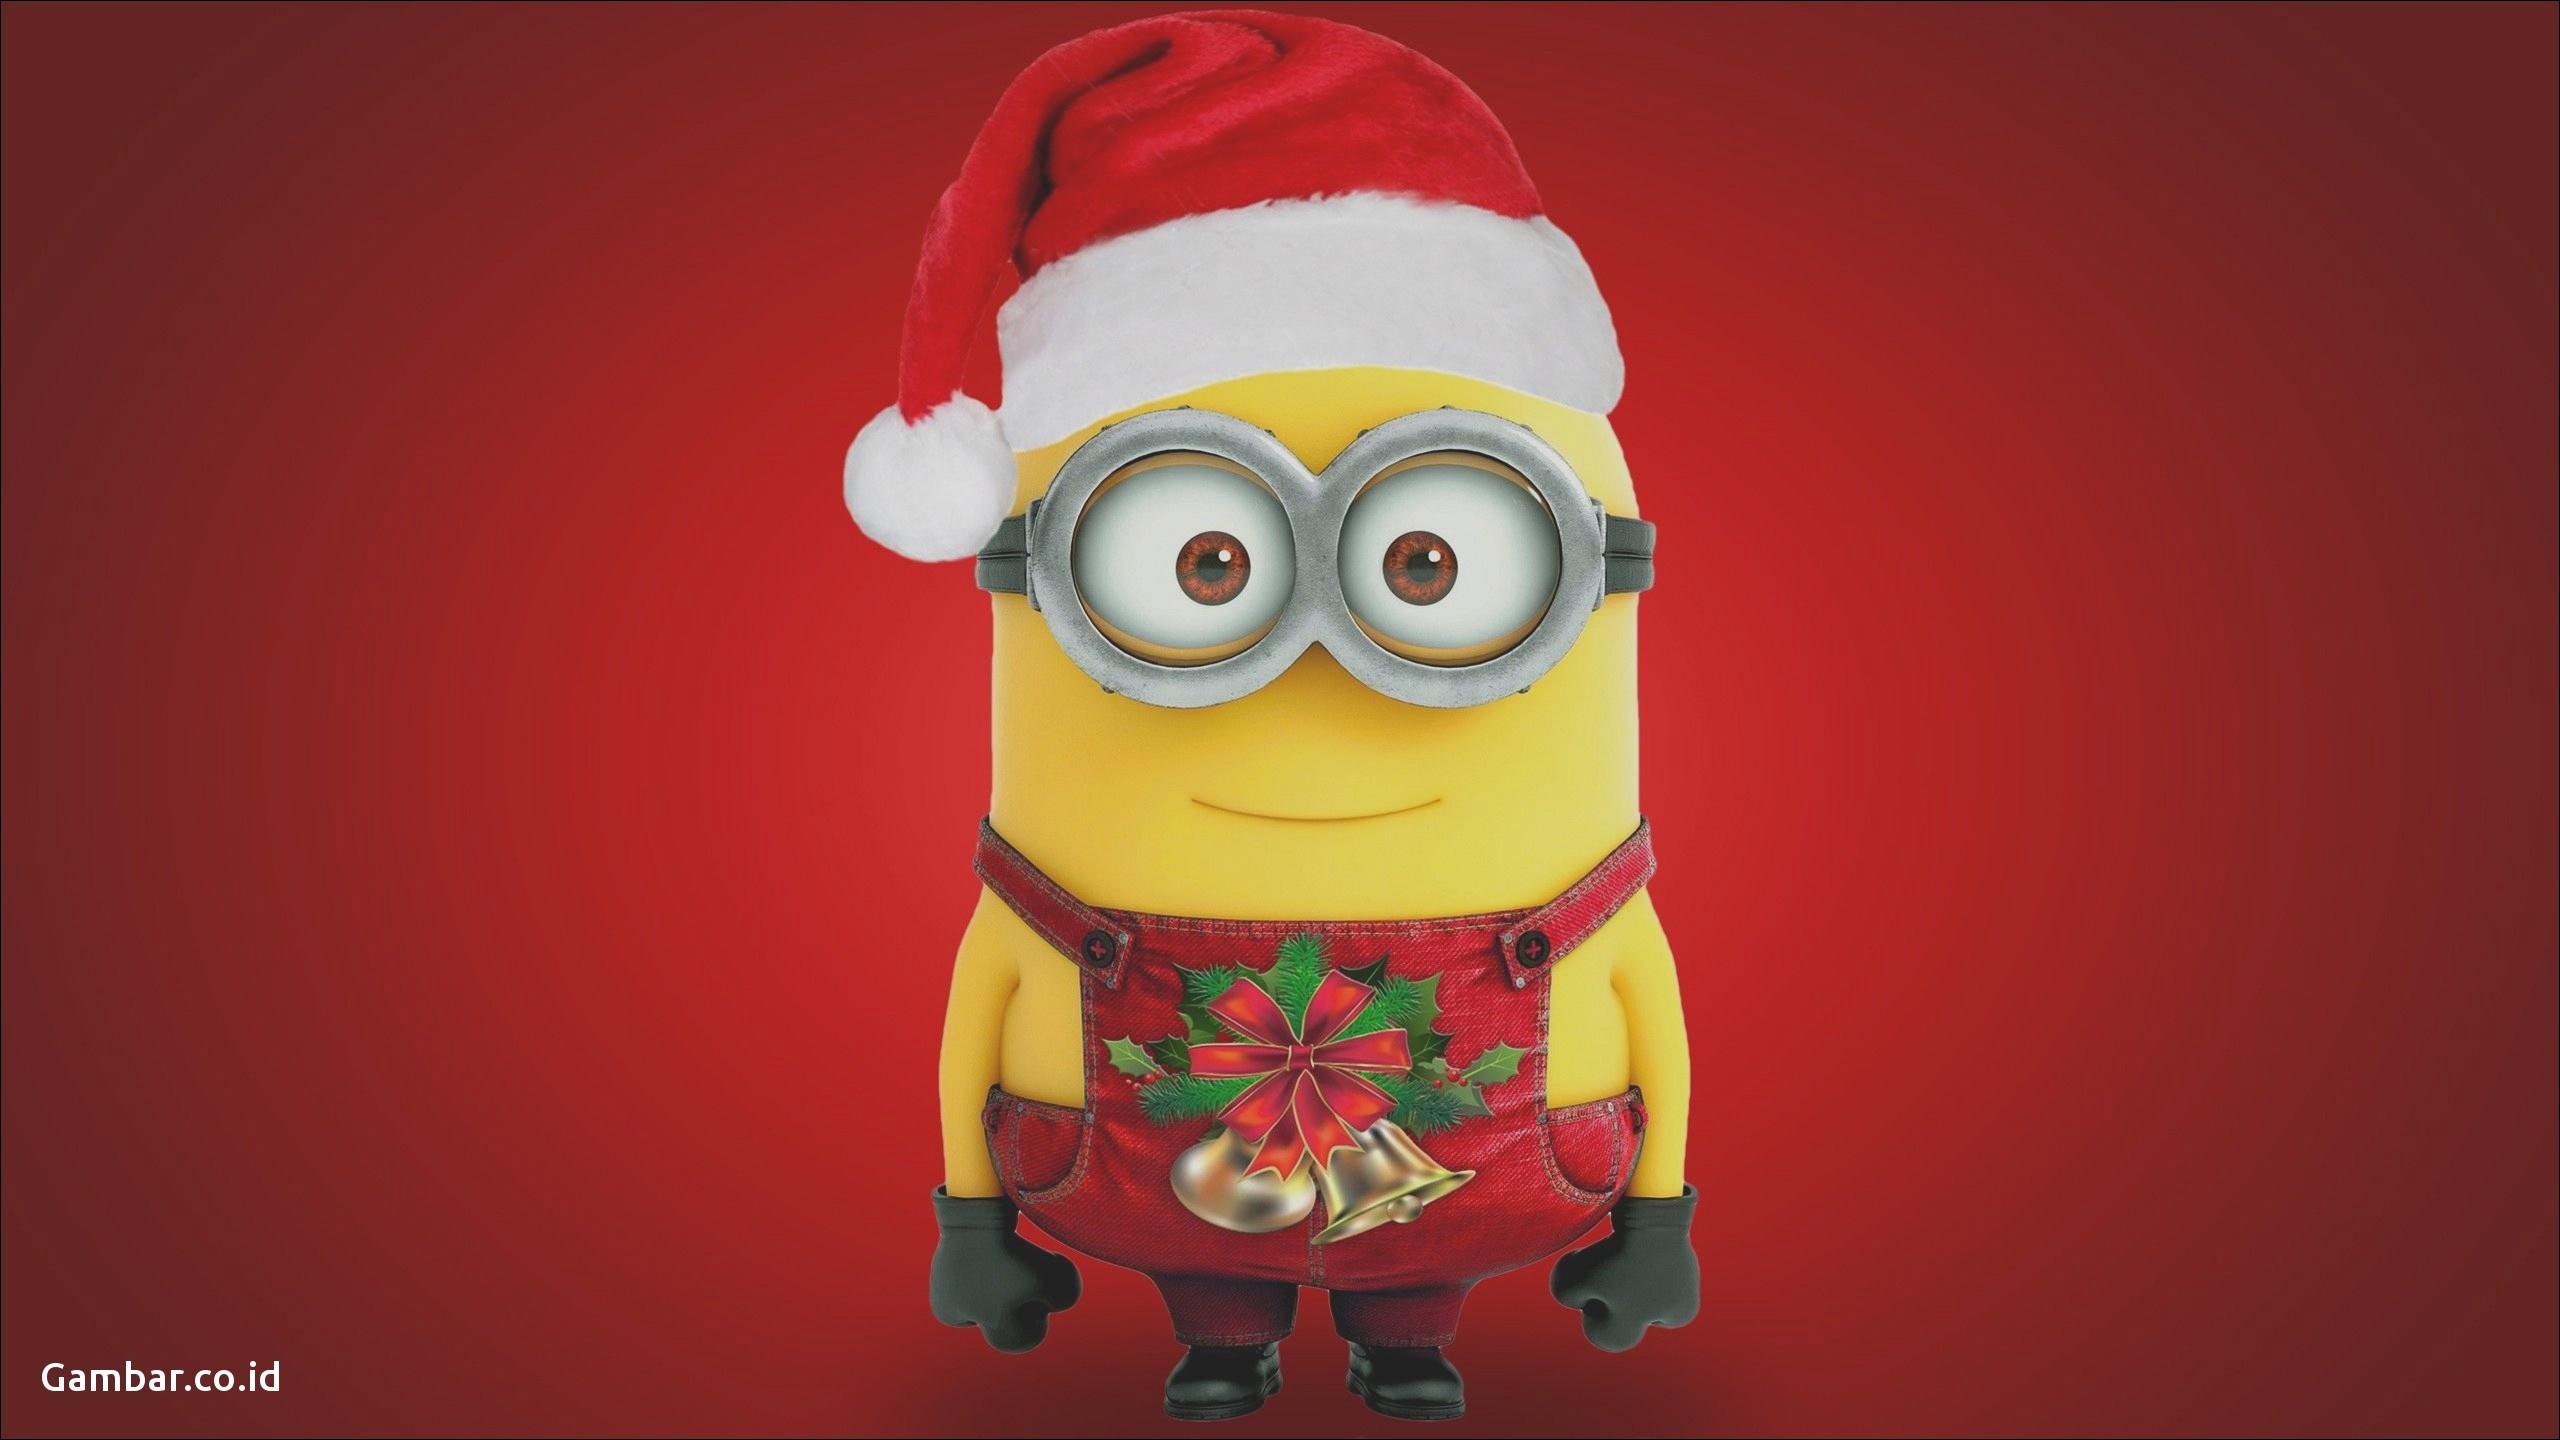 Wallpaper Minion Download Free Minions Christmas Tree